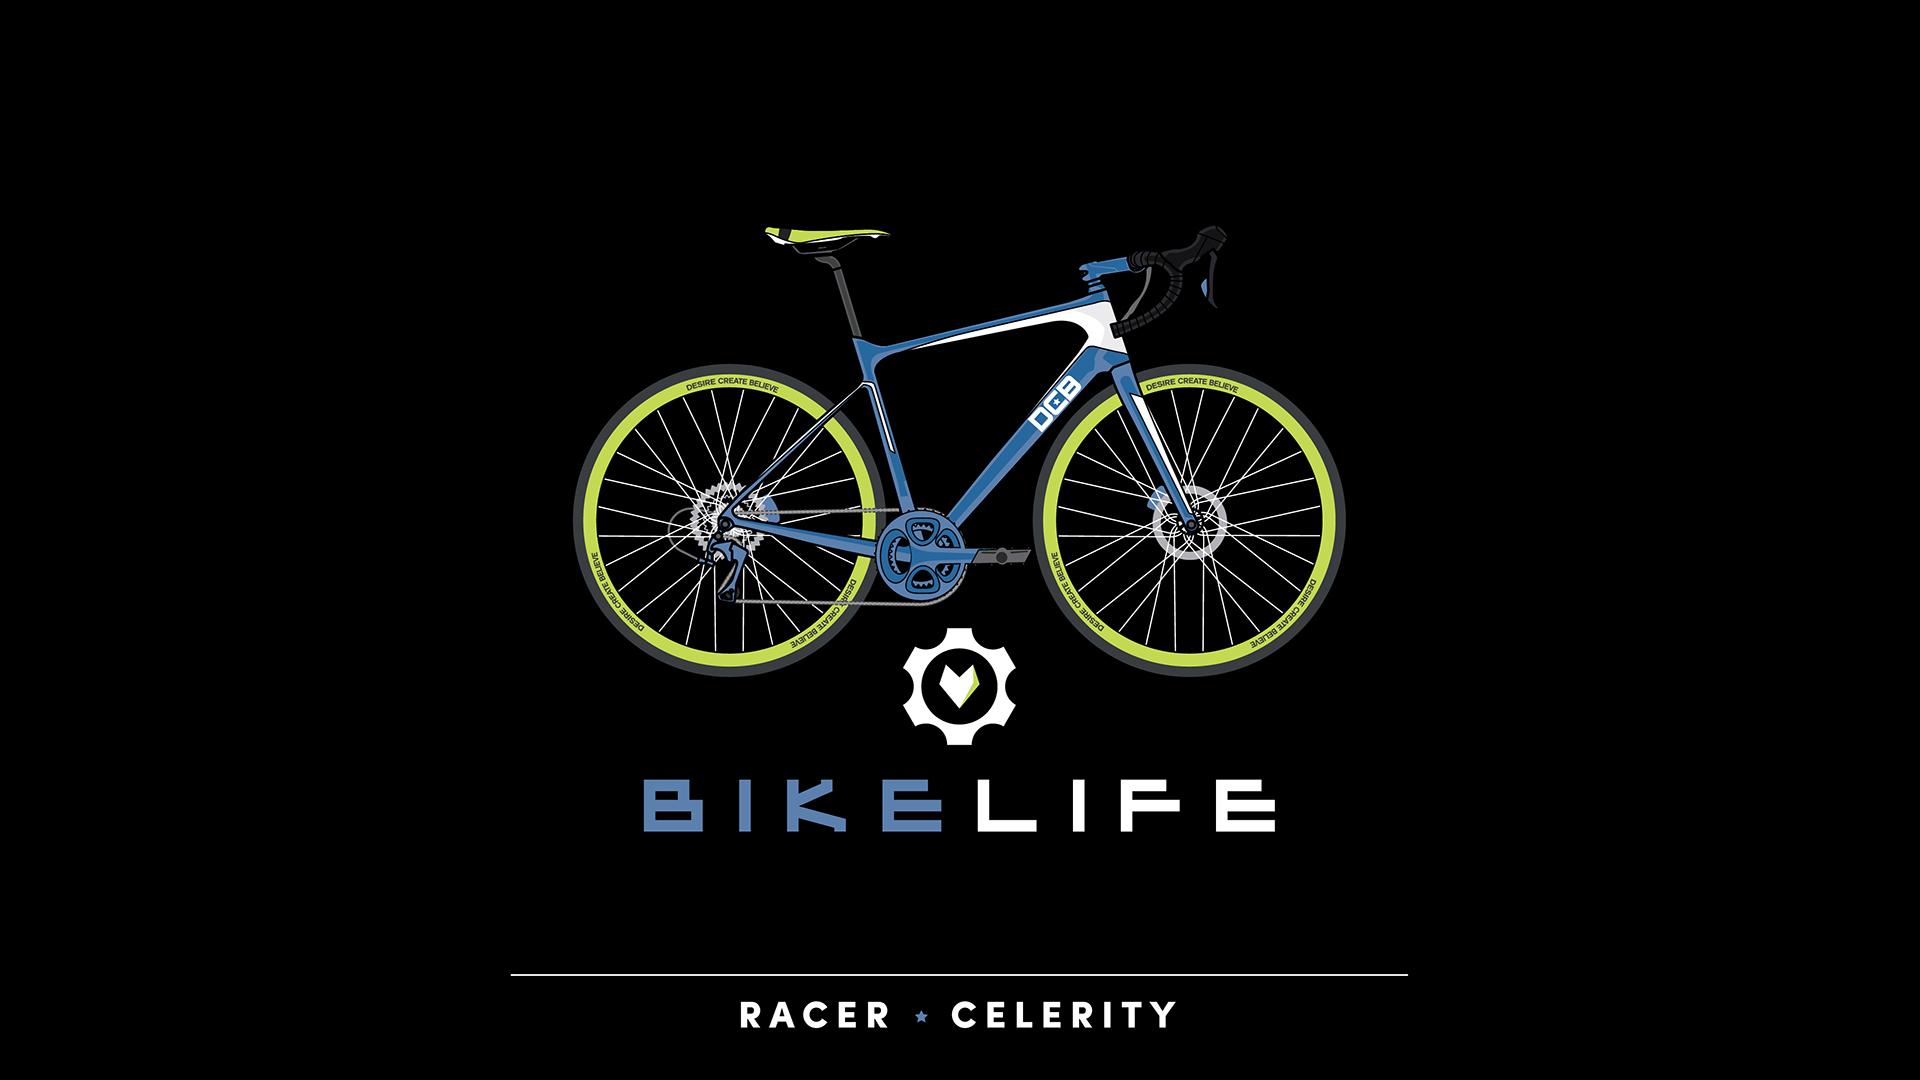 Bike Life Racer Celerity.jpg